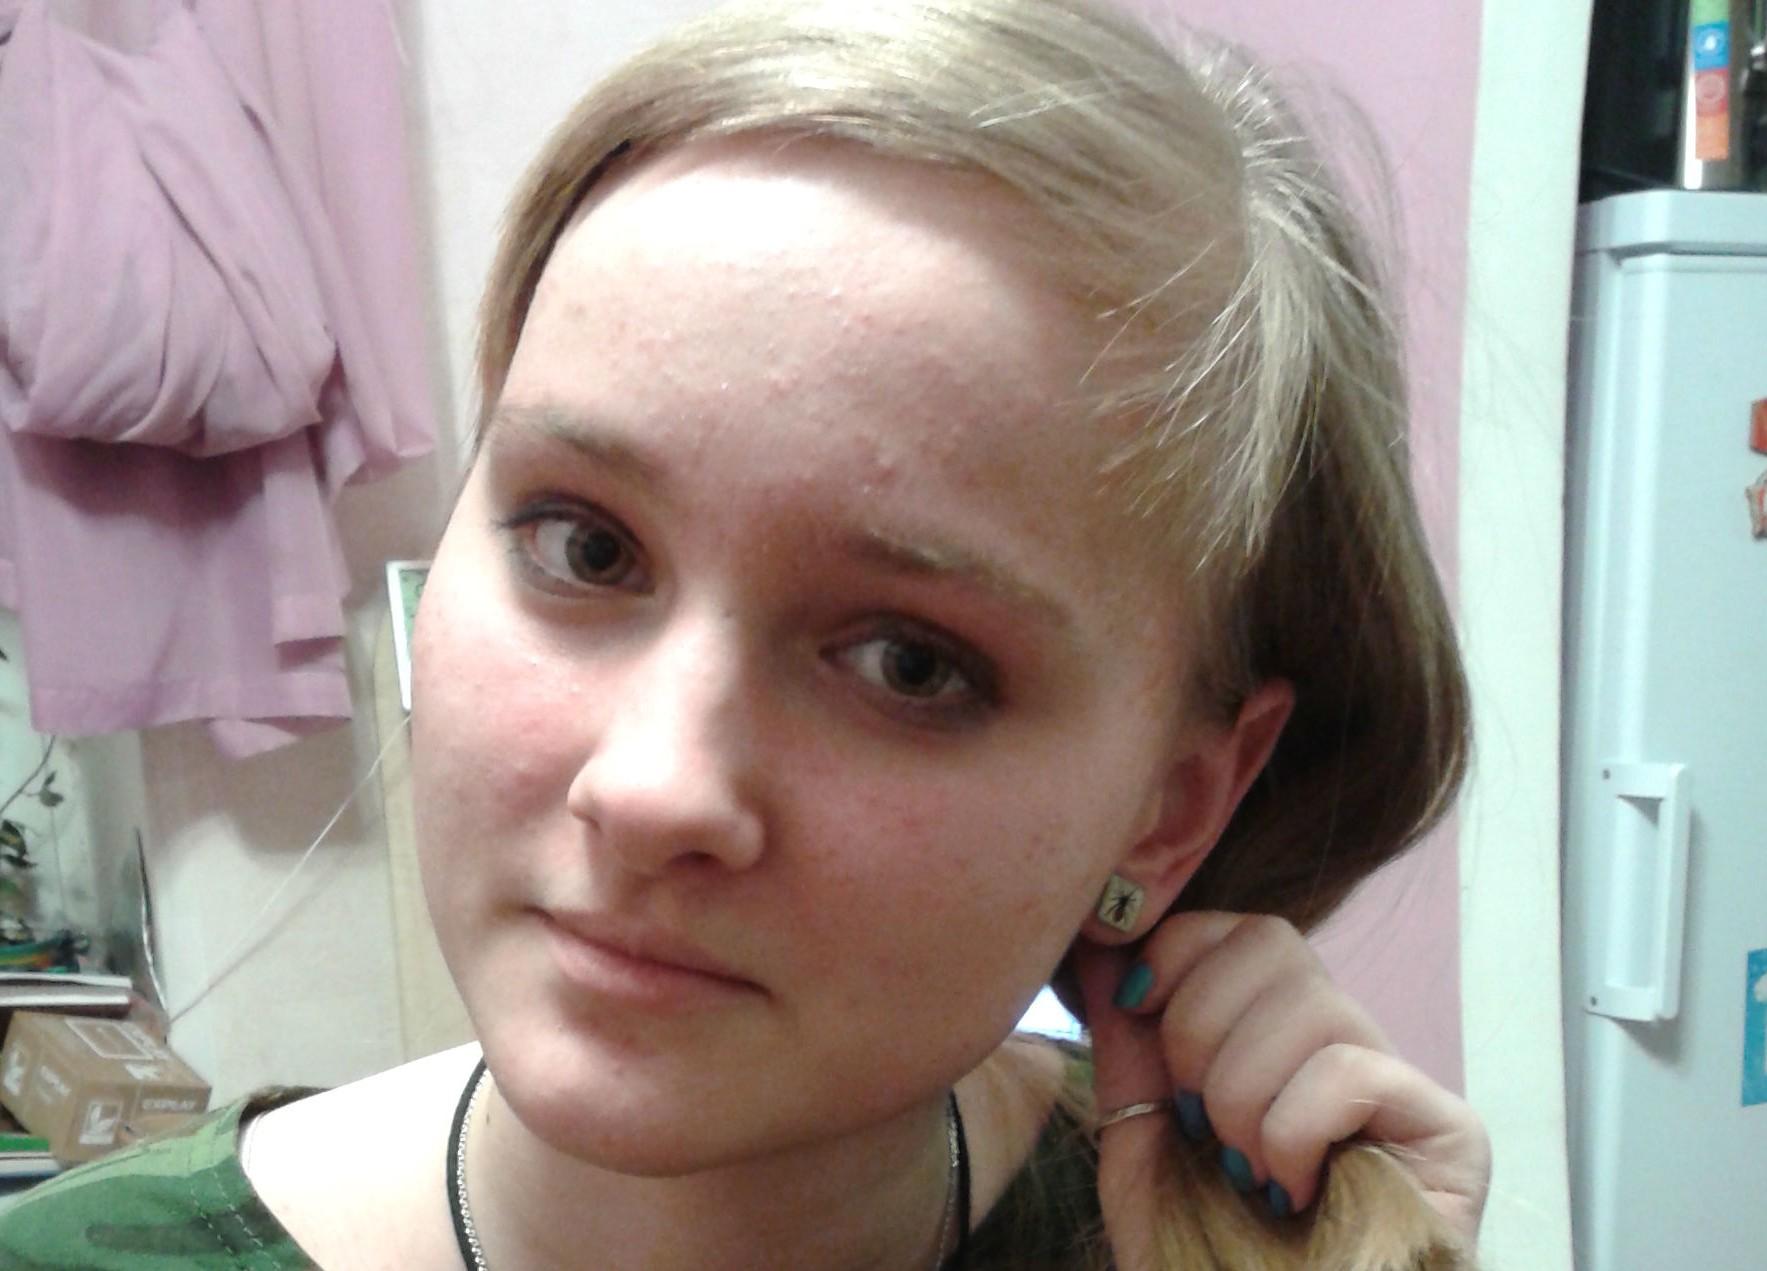 Прокуратура проверила школу в Ижевске, где ученице на уроке отрезали волосы